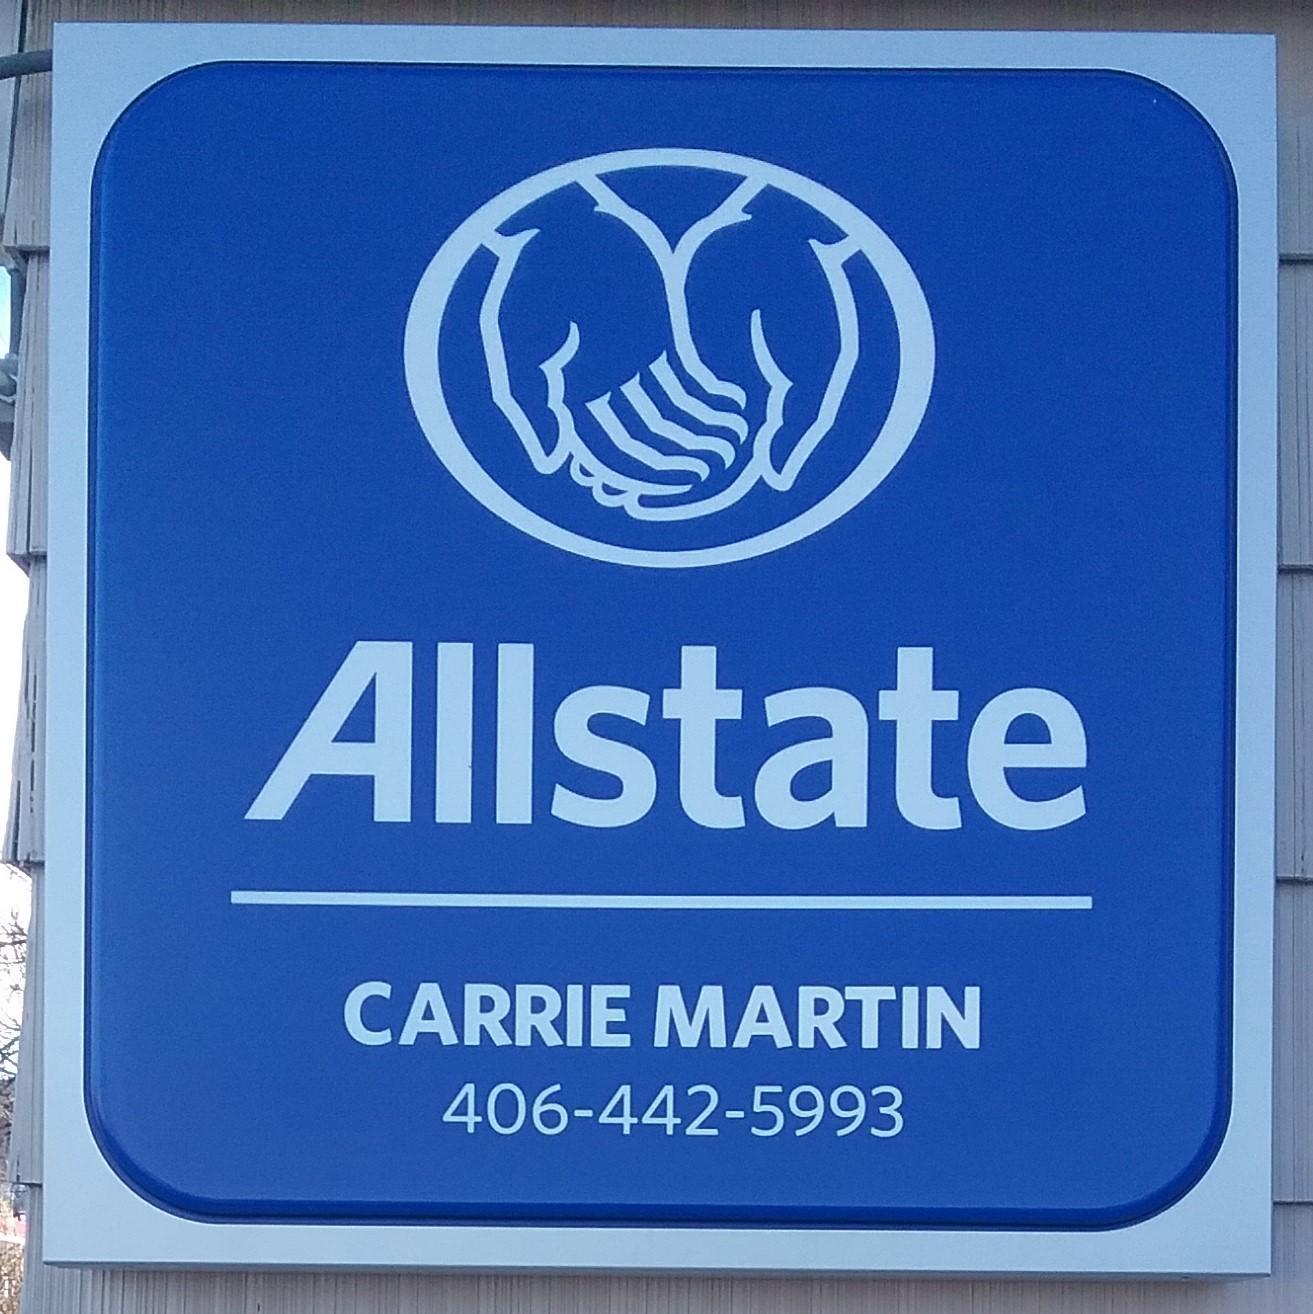 Carrie Martin: Allstate Insurance image 3